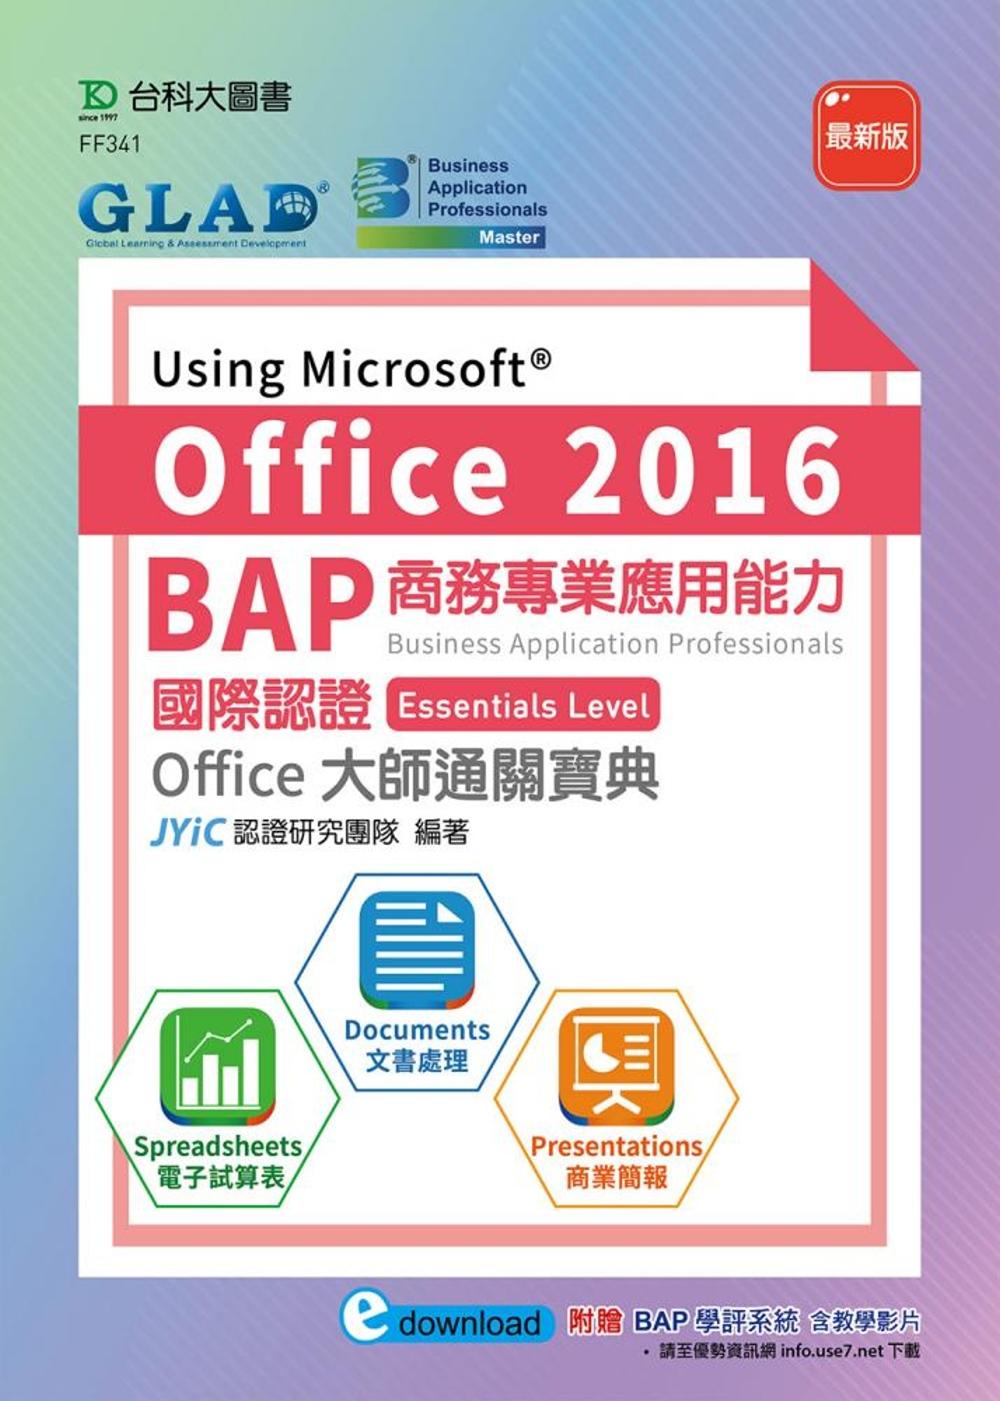 BAP Using Microsoft Office 2016商務專業應用能力國際認證Essentials Level Office大師通關寶典(Documents文書處理、Spreadsheets電子試算表、Presentations商業